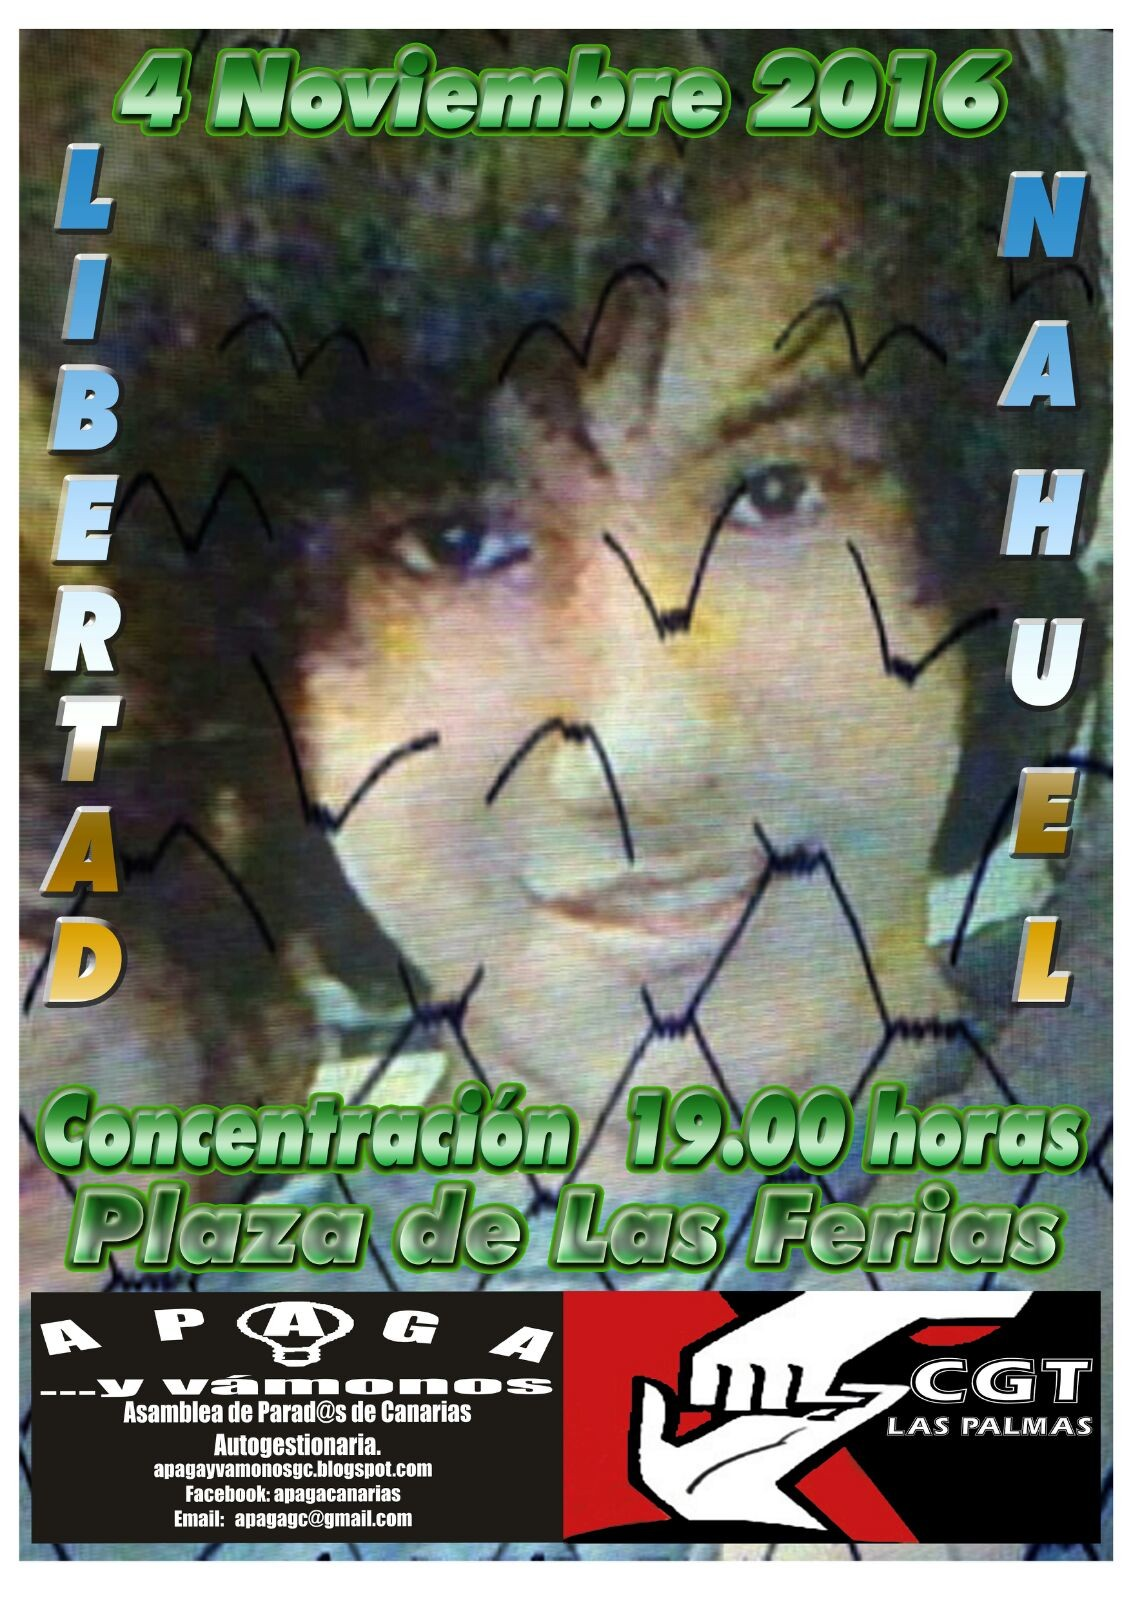 ¡¡¡NAHUEL LIBERTAD!!! ¡¡¡LIBERTAD PRES@S POLÌTIC@S!!!